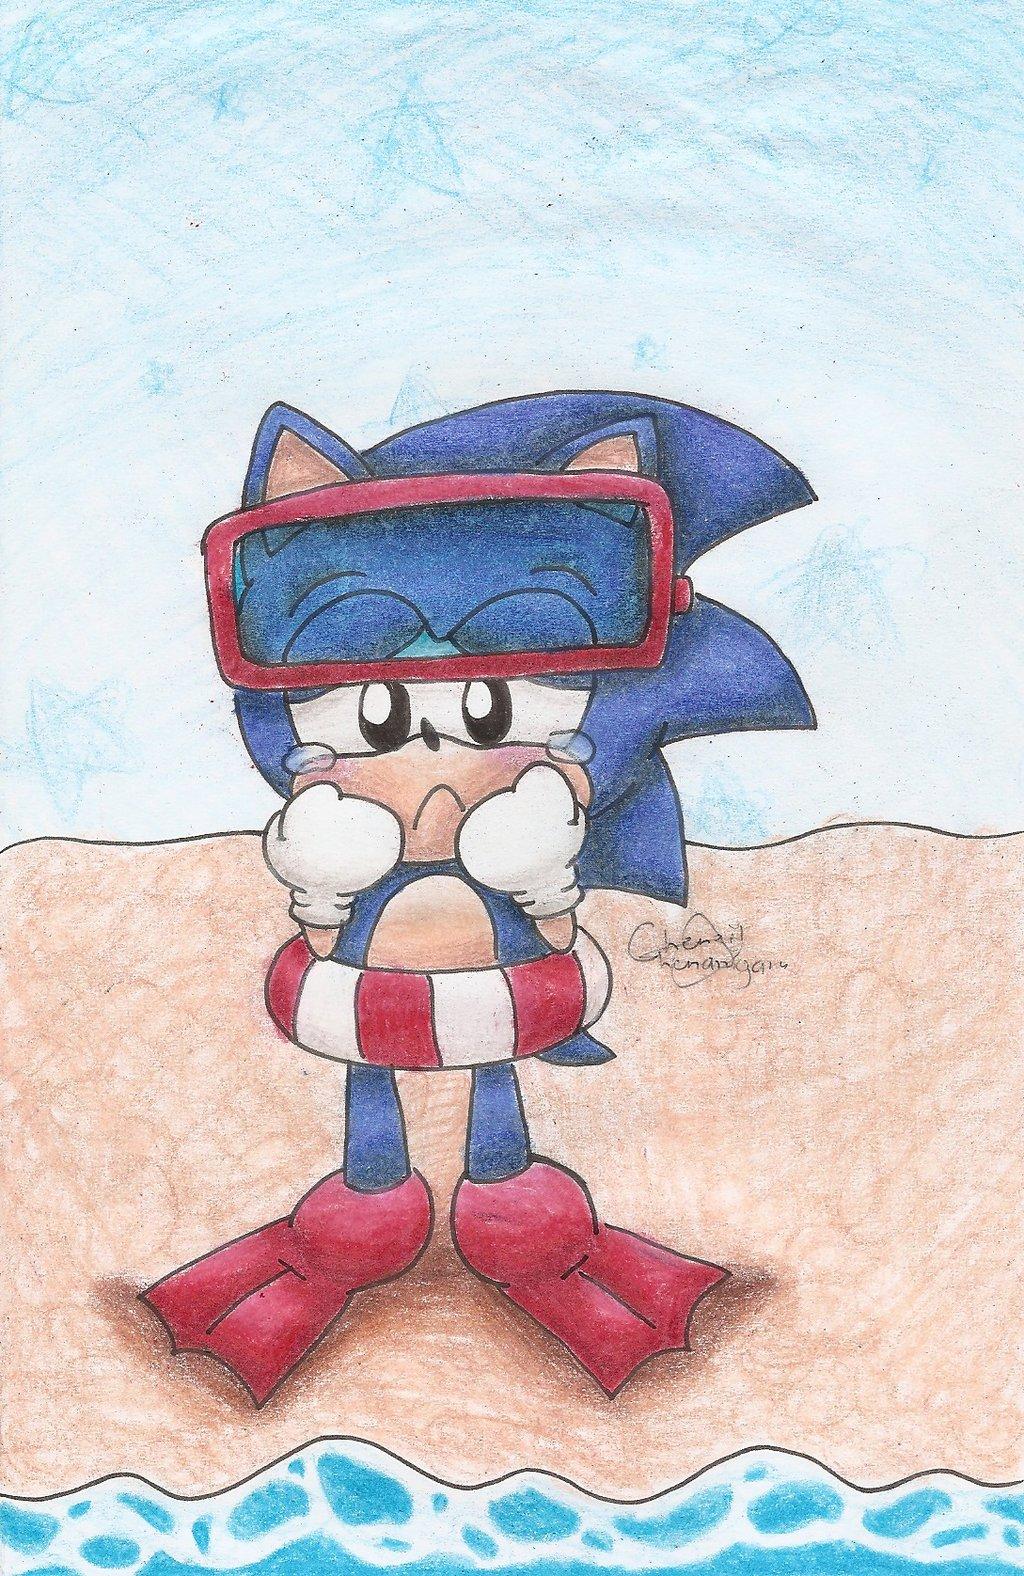 Sonic's swimming